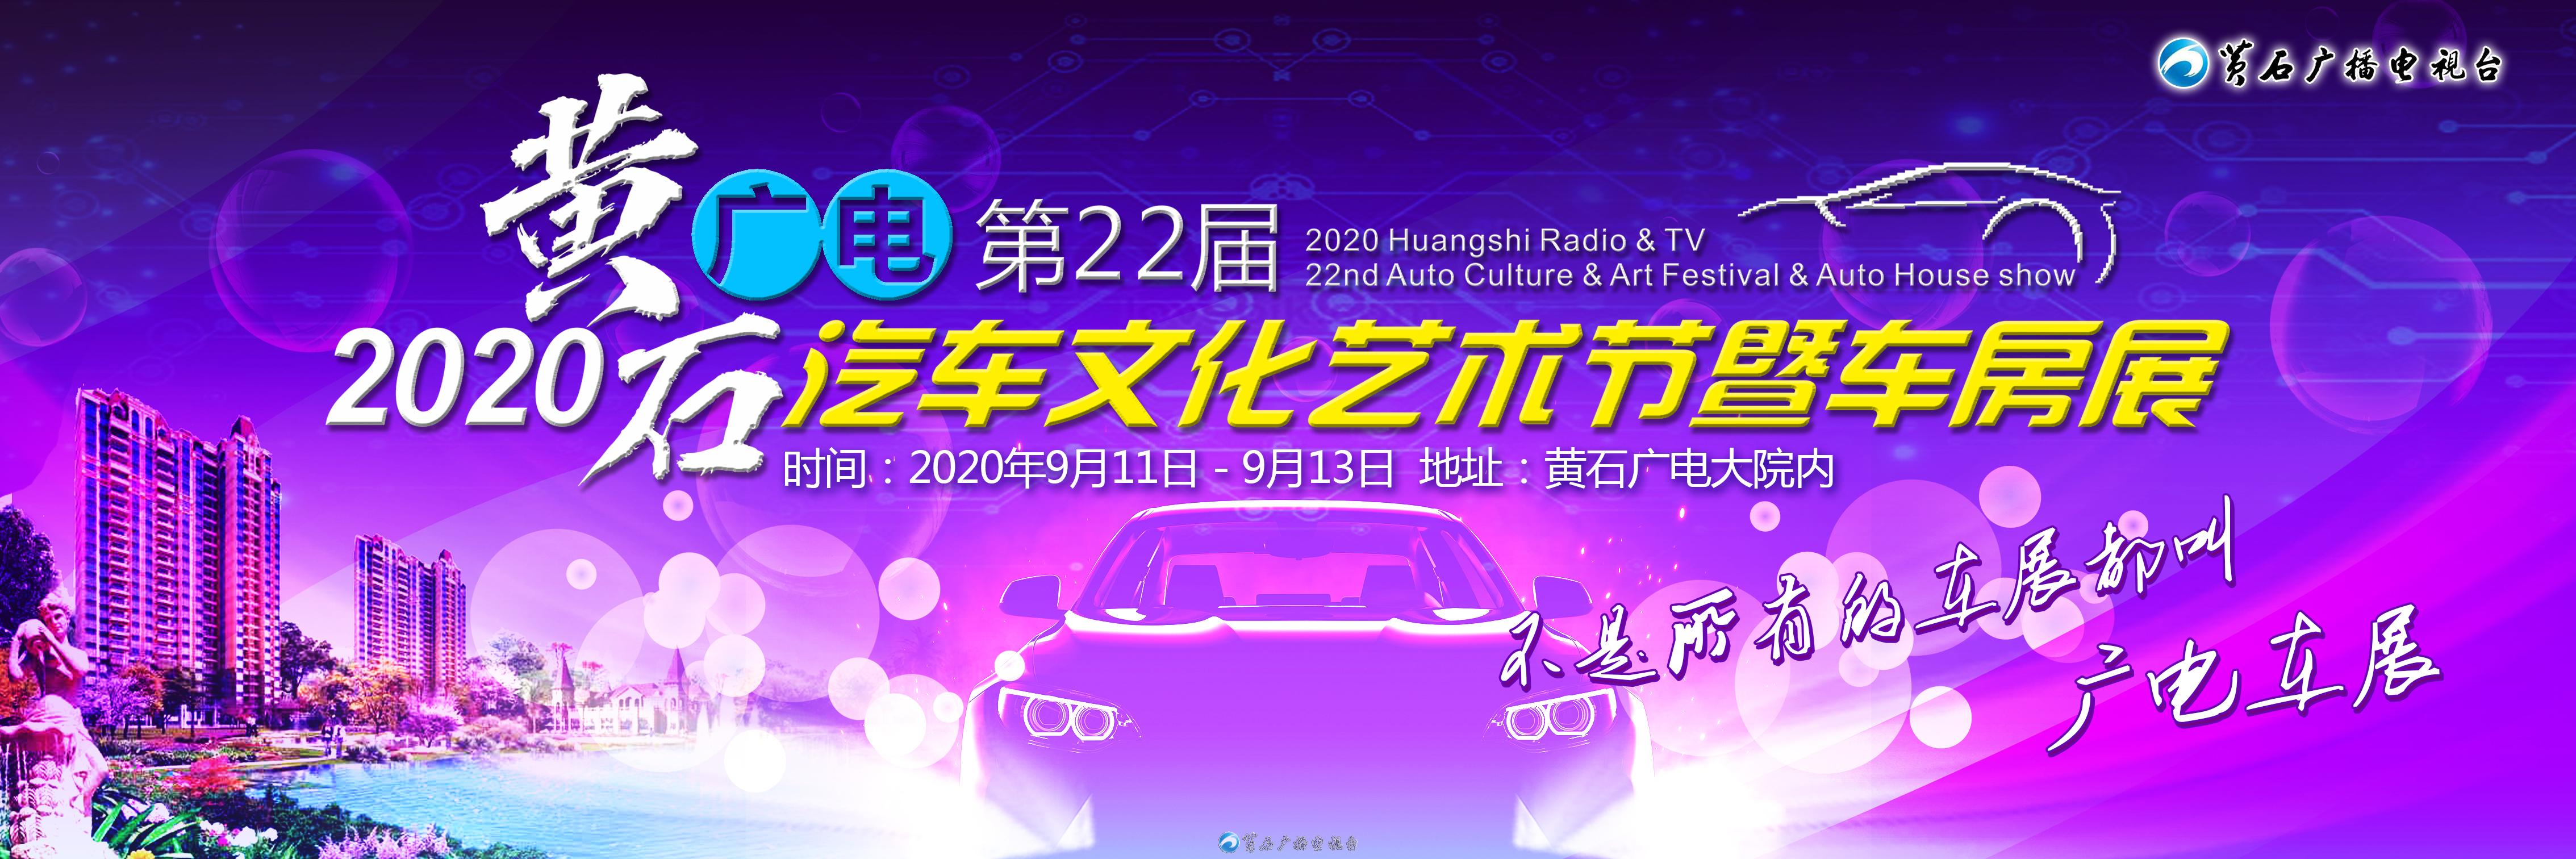 title='2020年黄石广电第22届汽车文化艺术节暨车房展巡游直播活动'